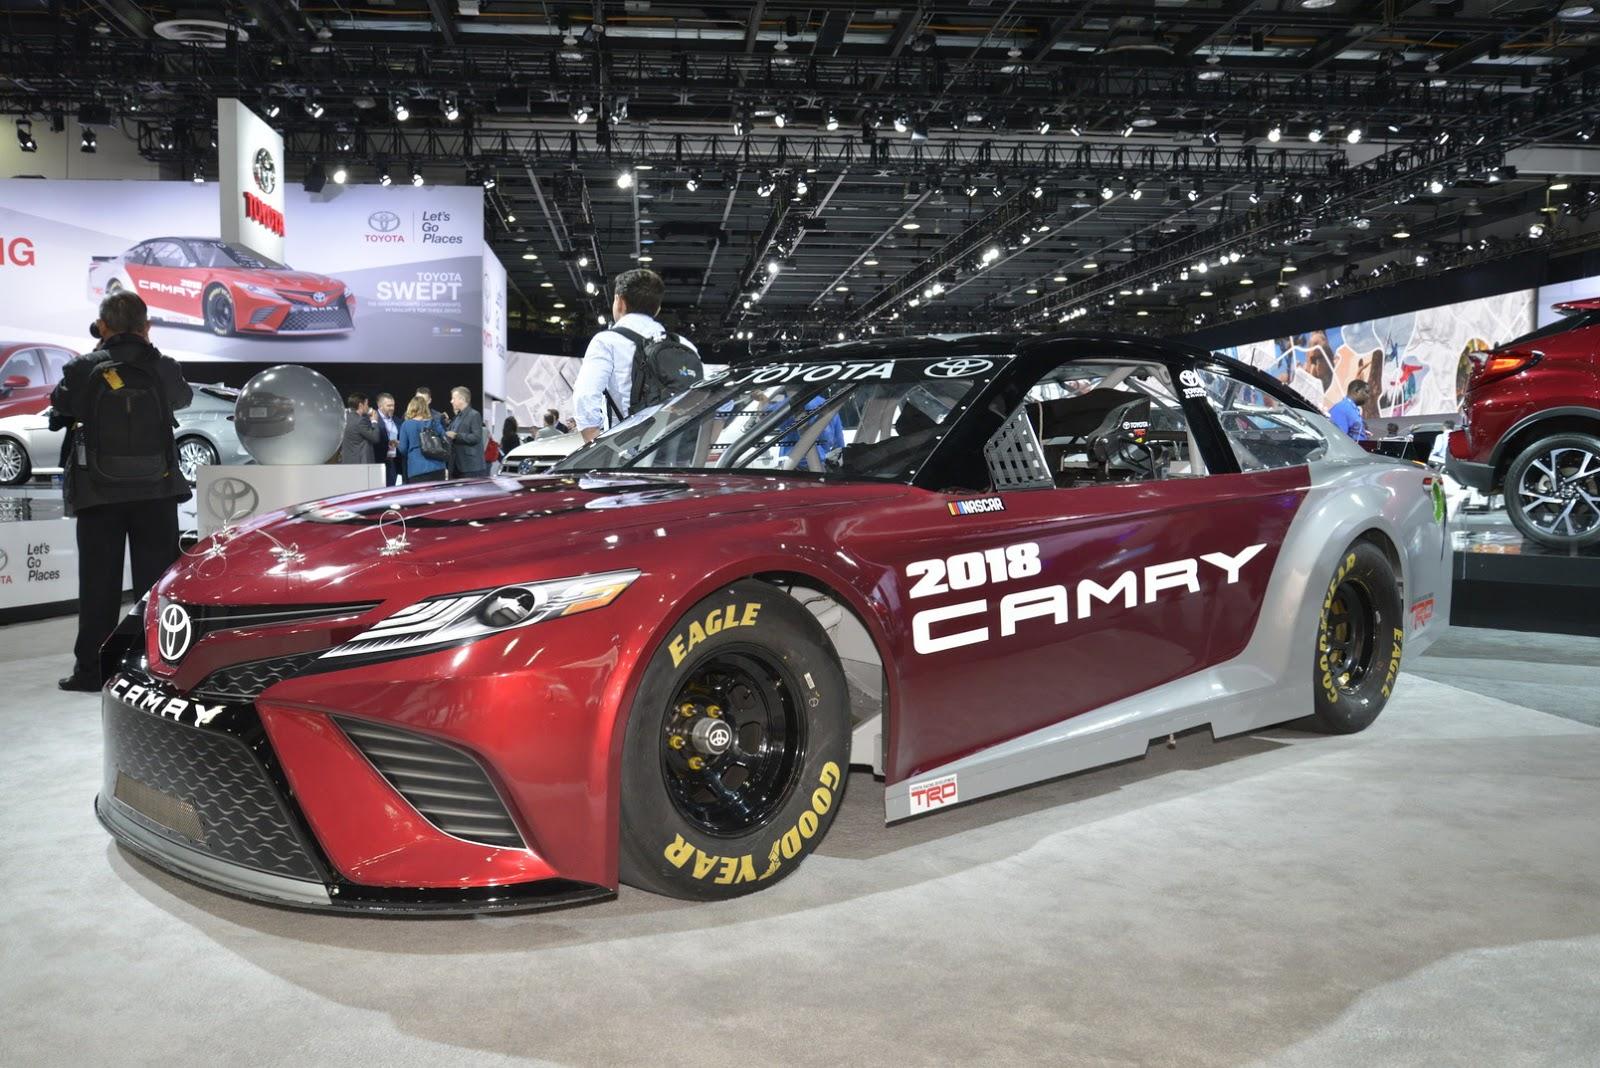 Nascar Camry Toyota 2017